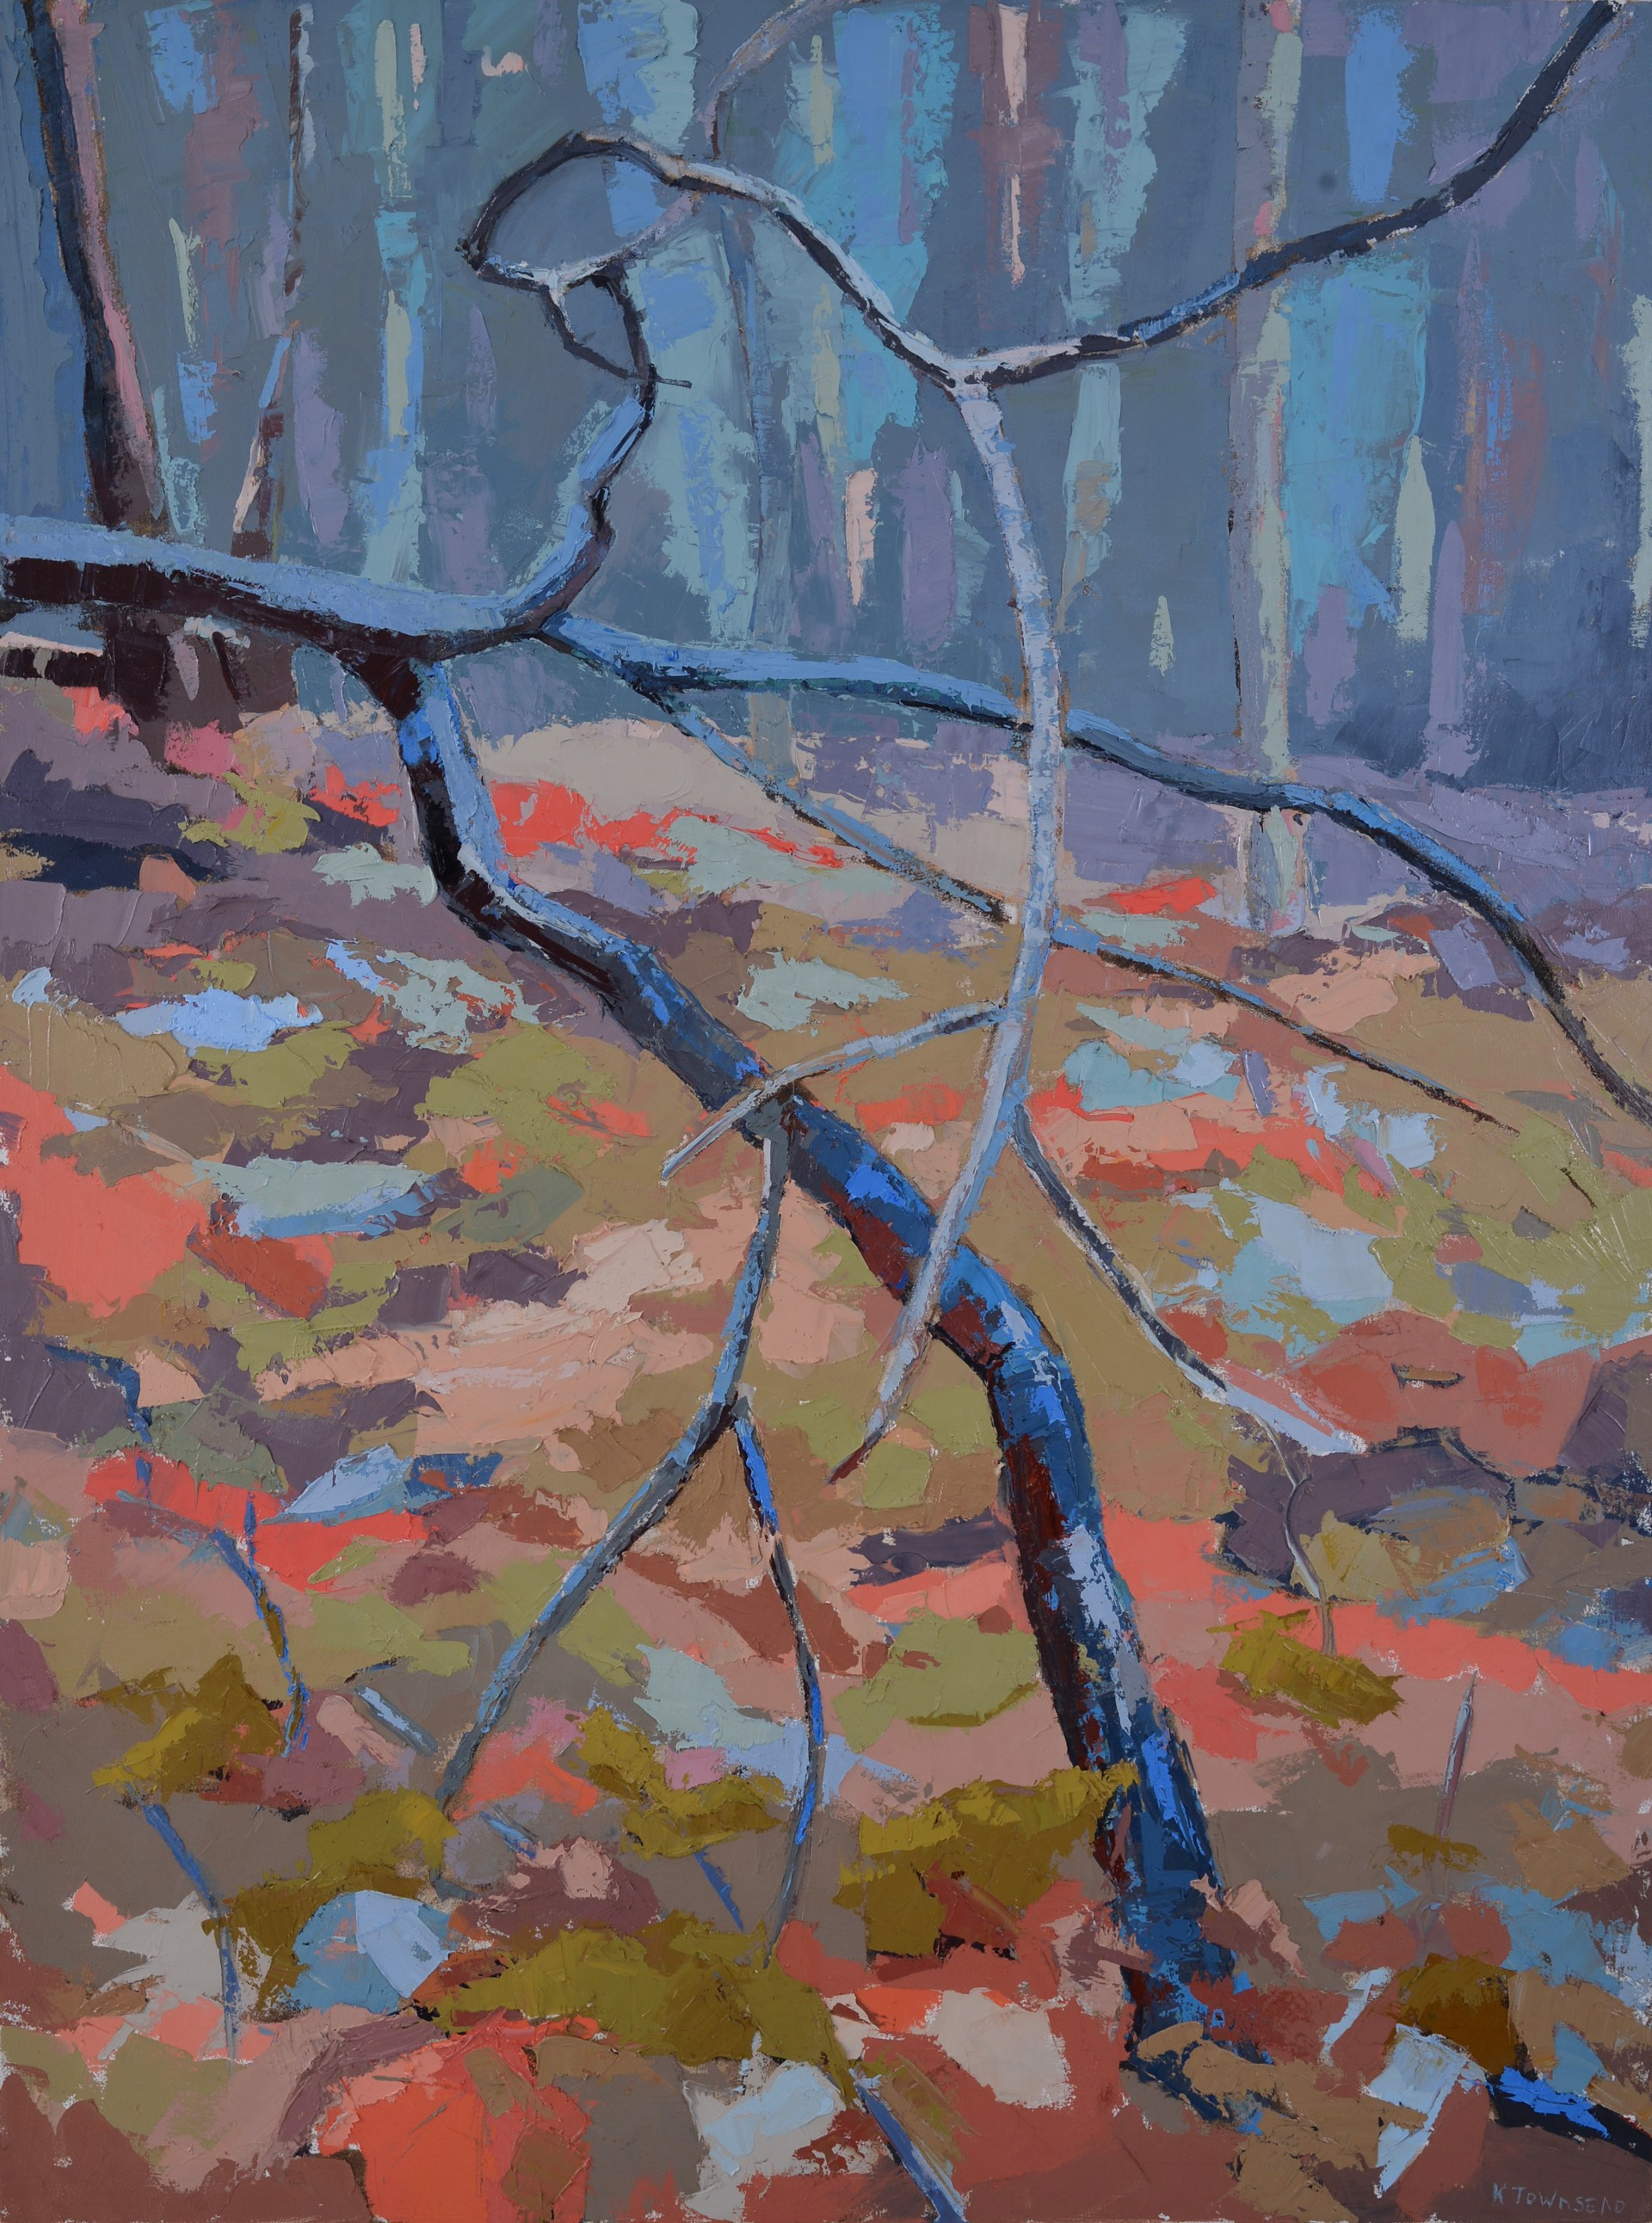 Blue Stick by Krista Townsend